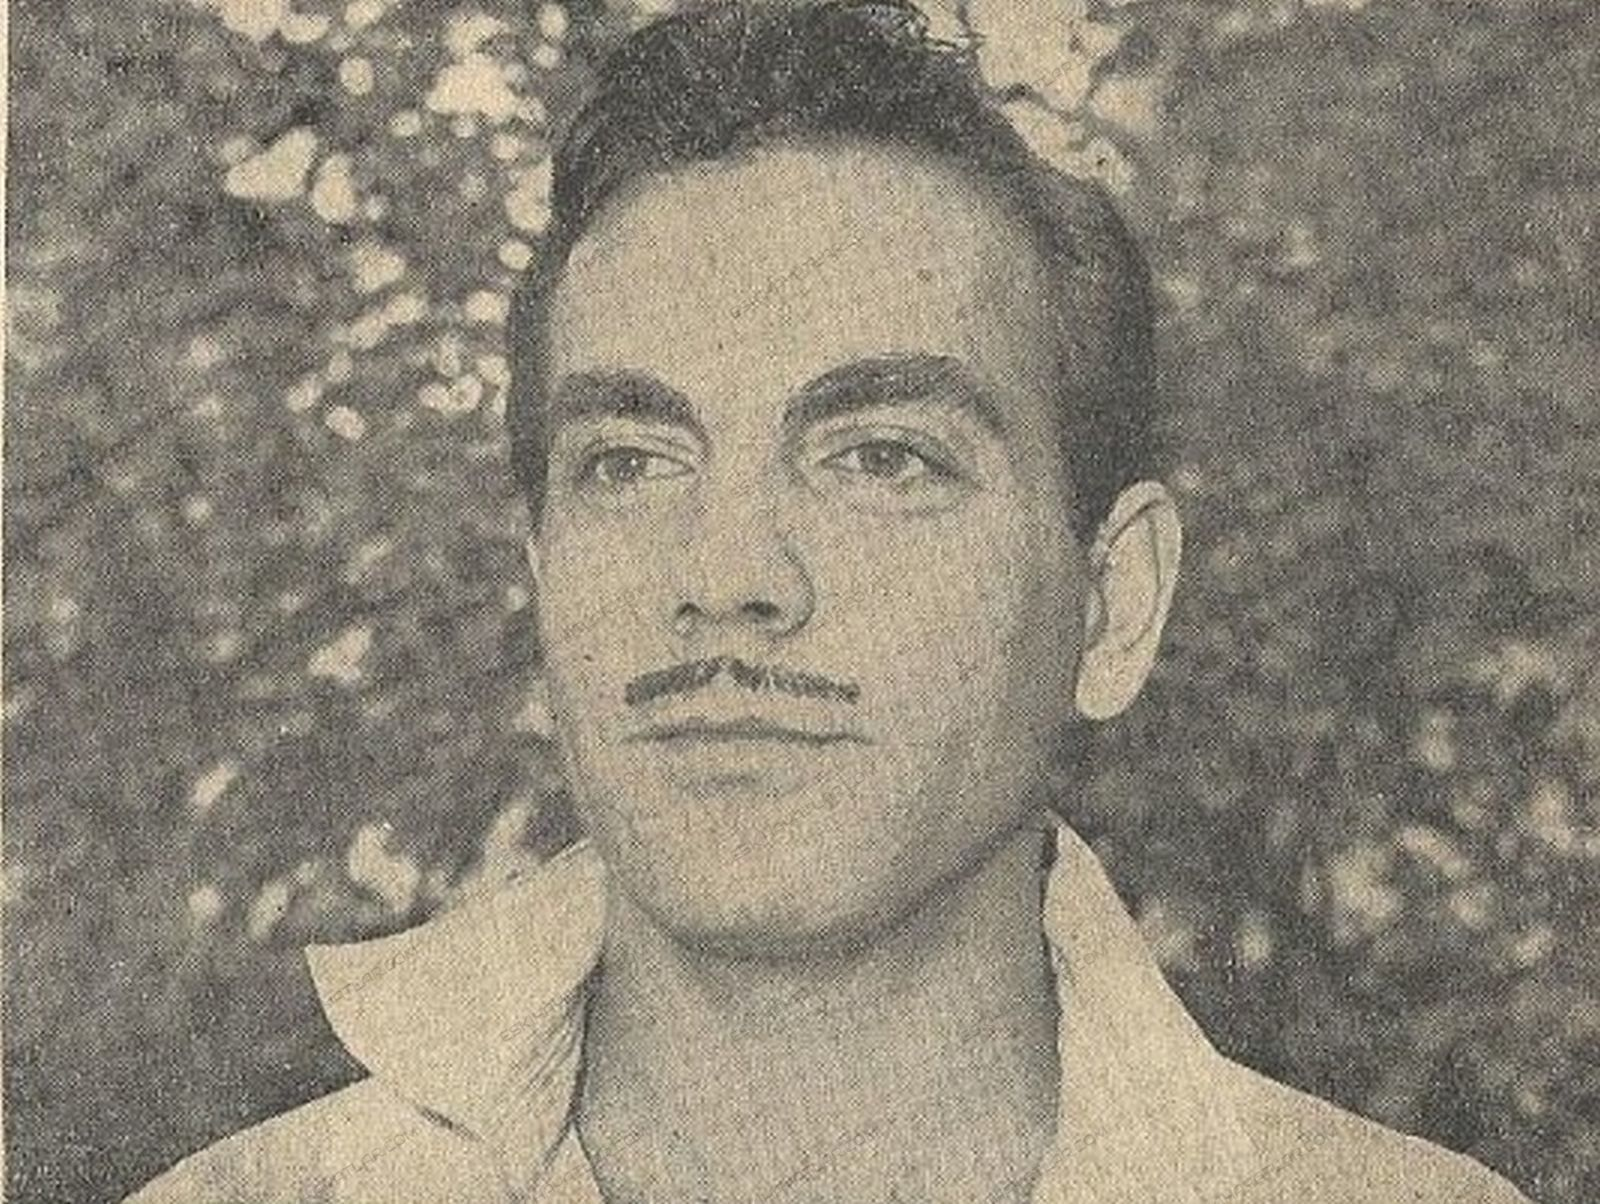 0245-ayhan-isik-roportaji-1962-artist-dergisi-ayhan-isiyan-kimdir (6)